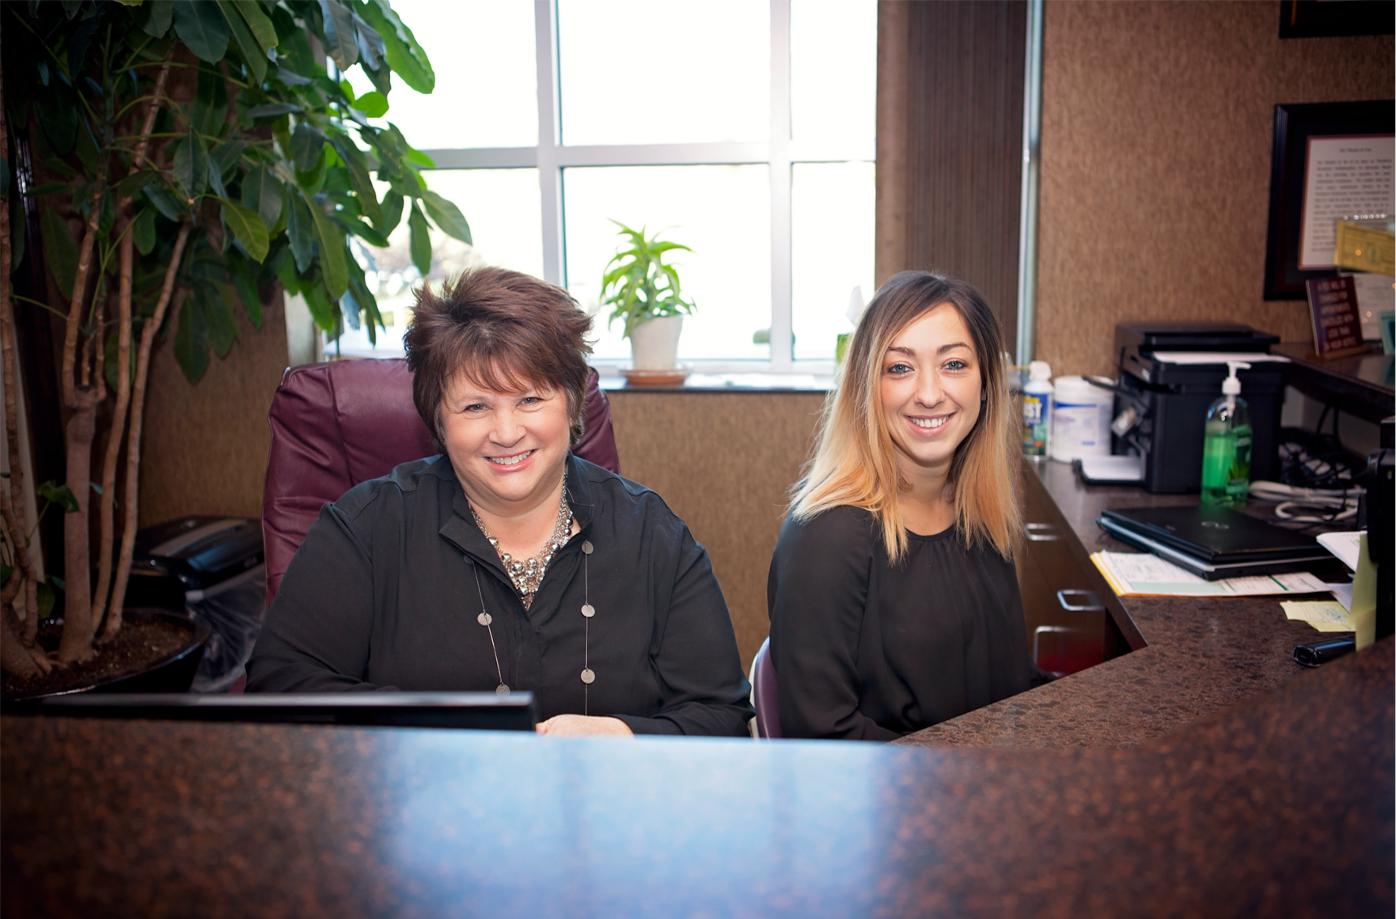 NKY Endodontics Staff